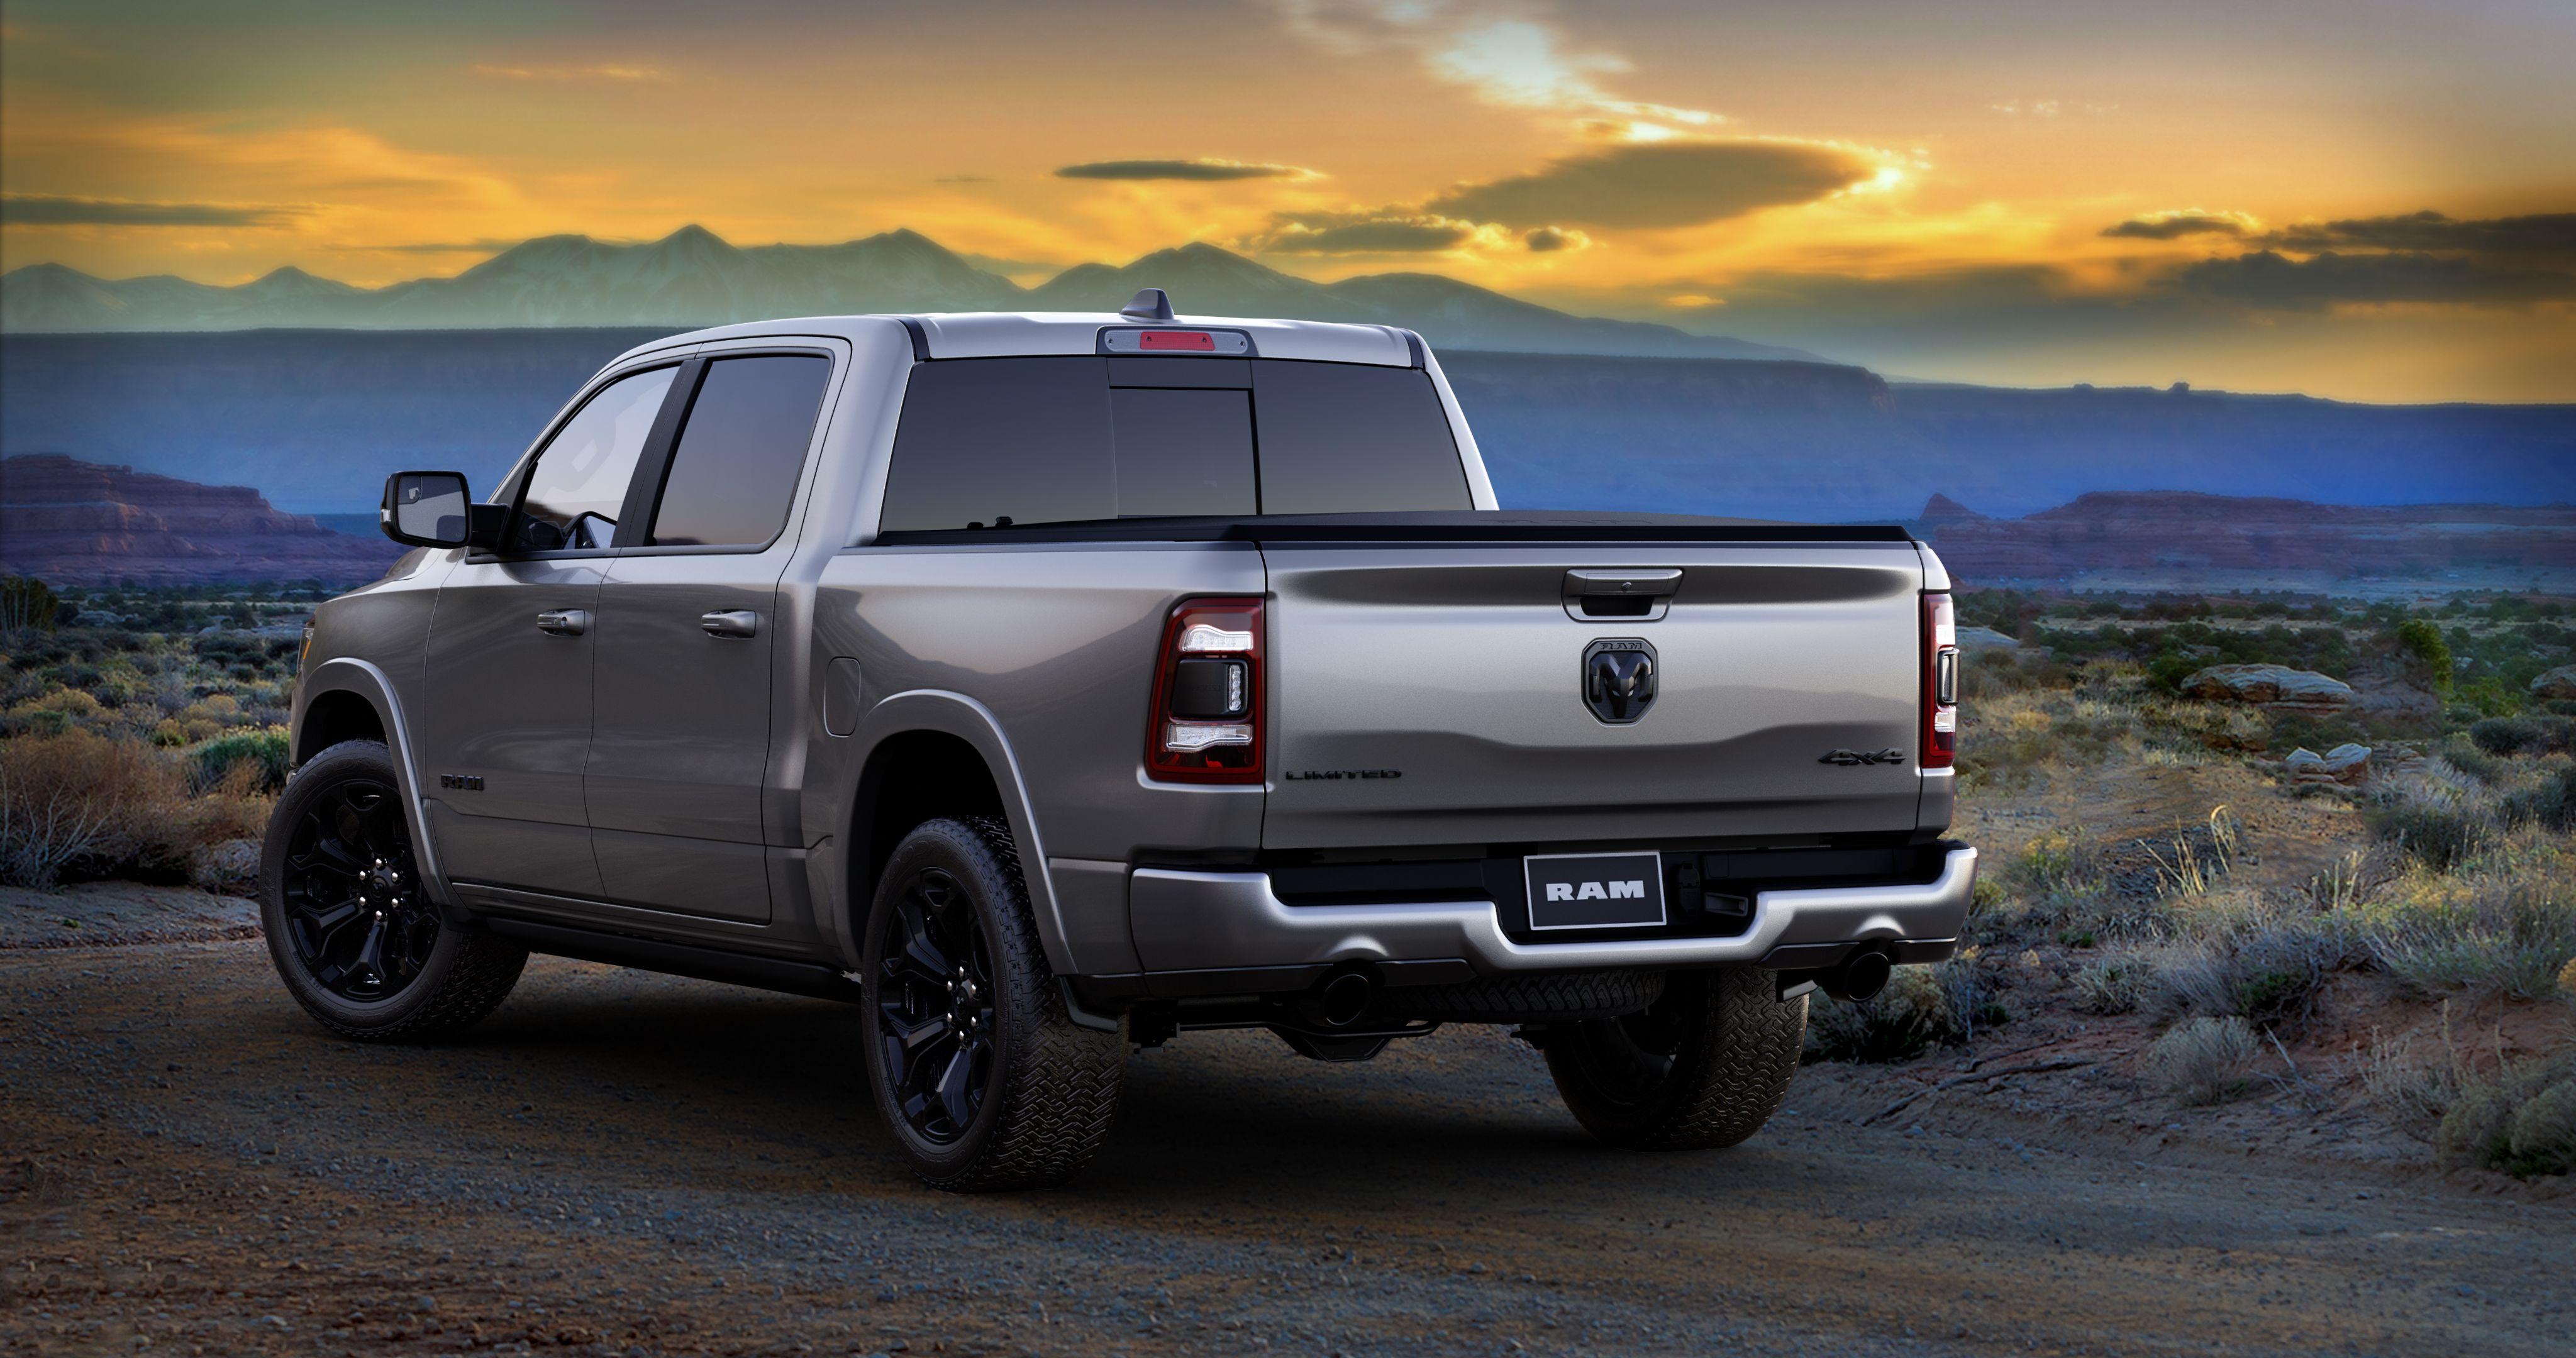 2021 Ram 1500 Hd Trucks Get Limited Night Editions